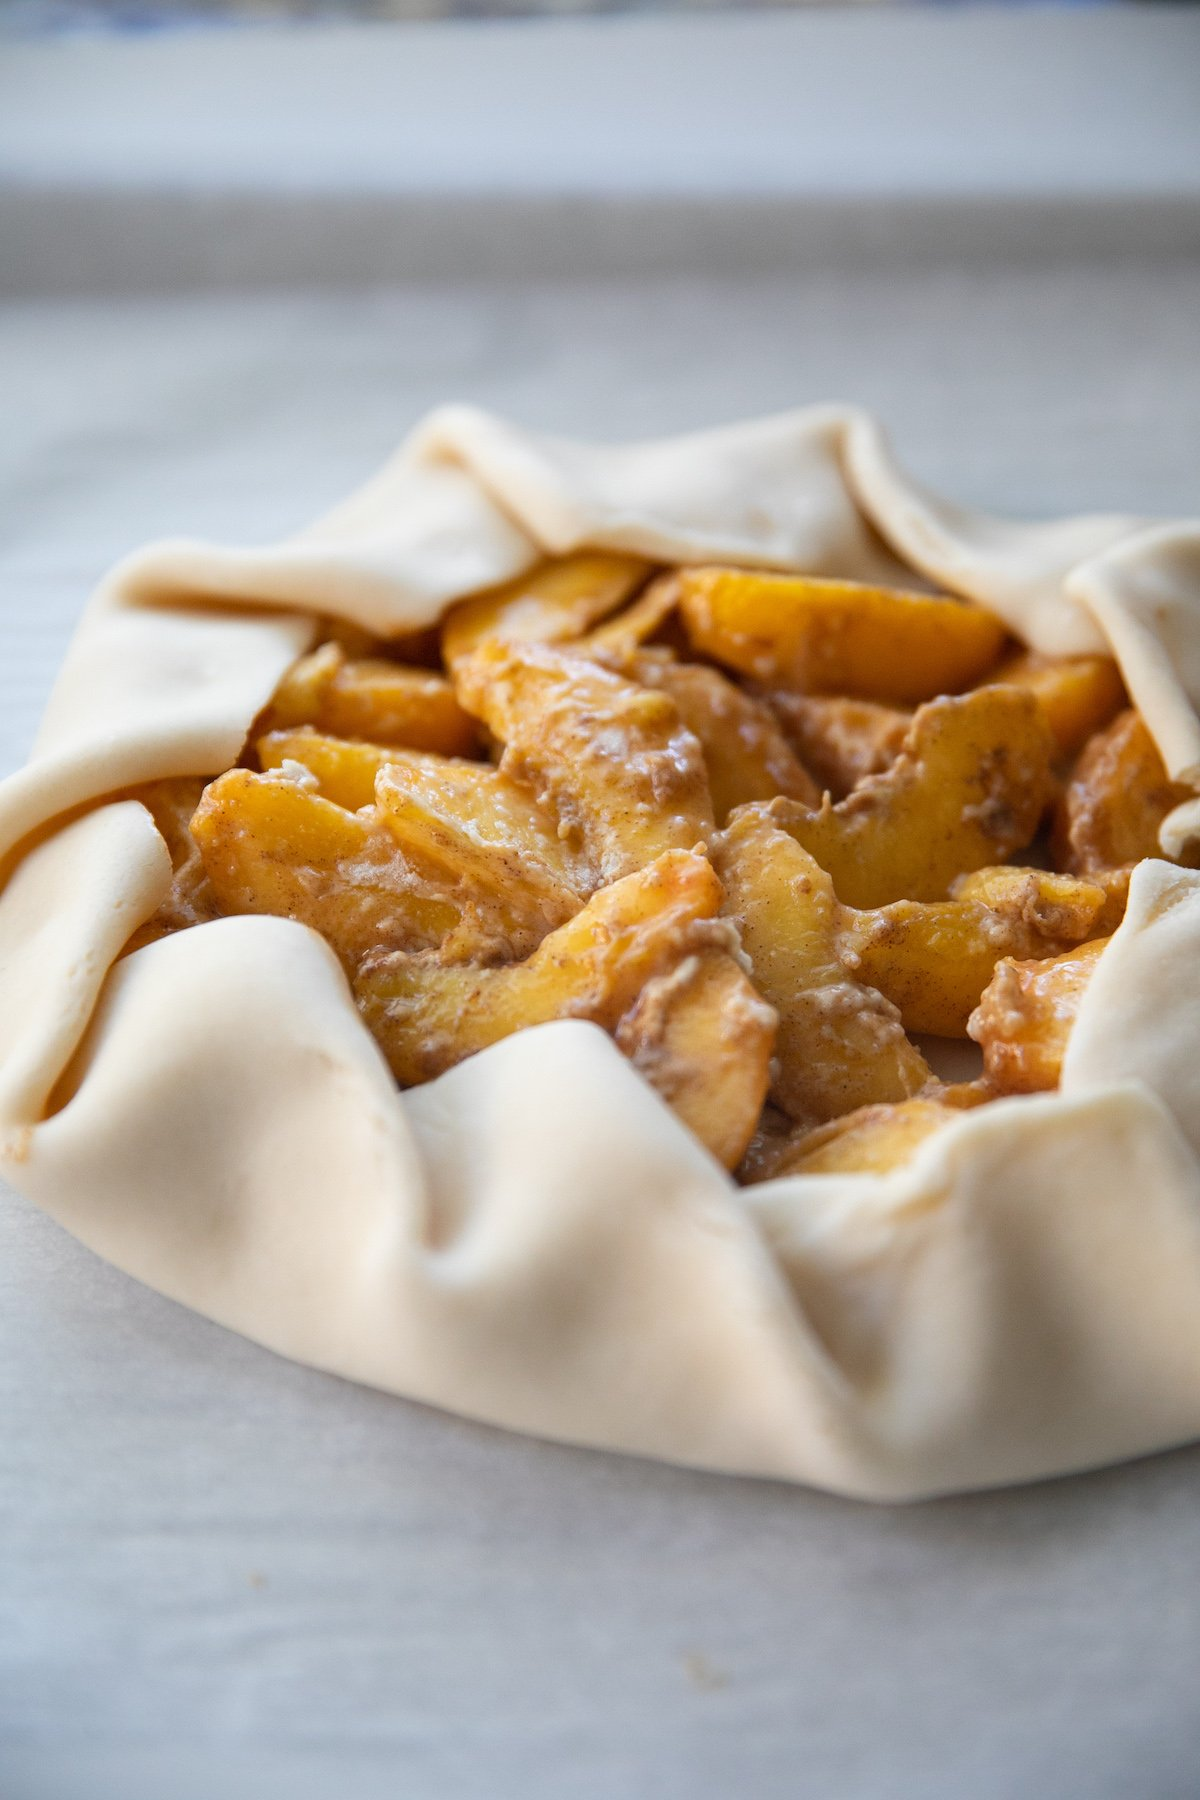 freshly folded up peach galette